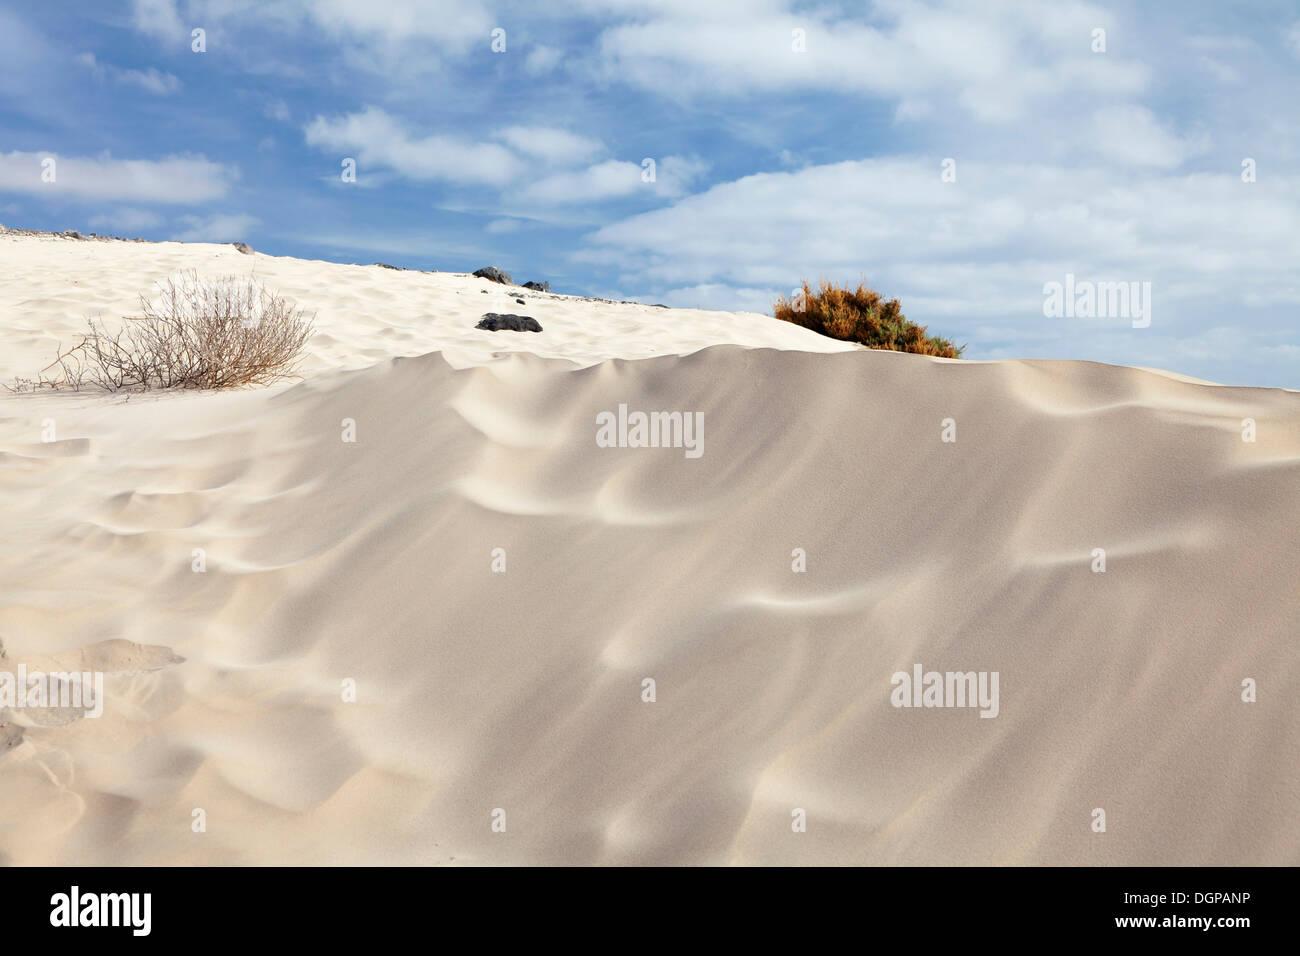 Sanddünen, Dünenlandschaft, Risco del Paso, Fuerteventura, Kanarische Inseln, Spanien Stockbild